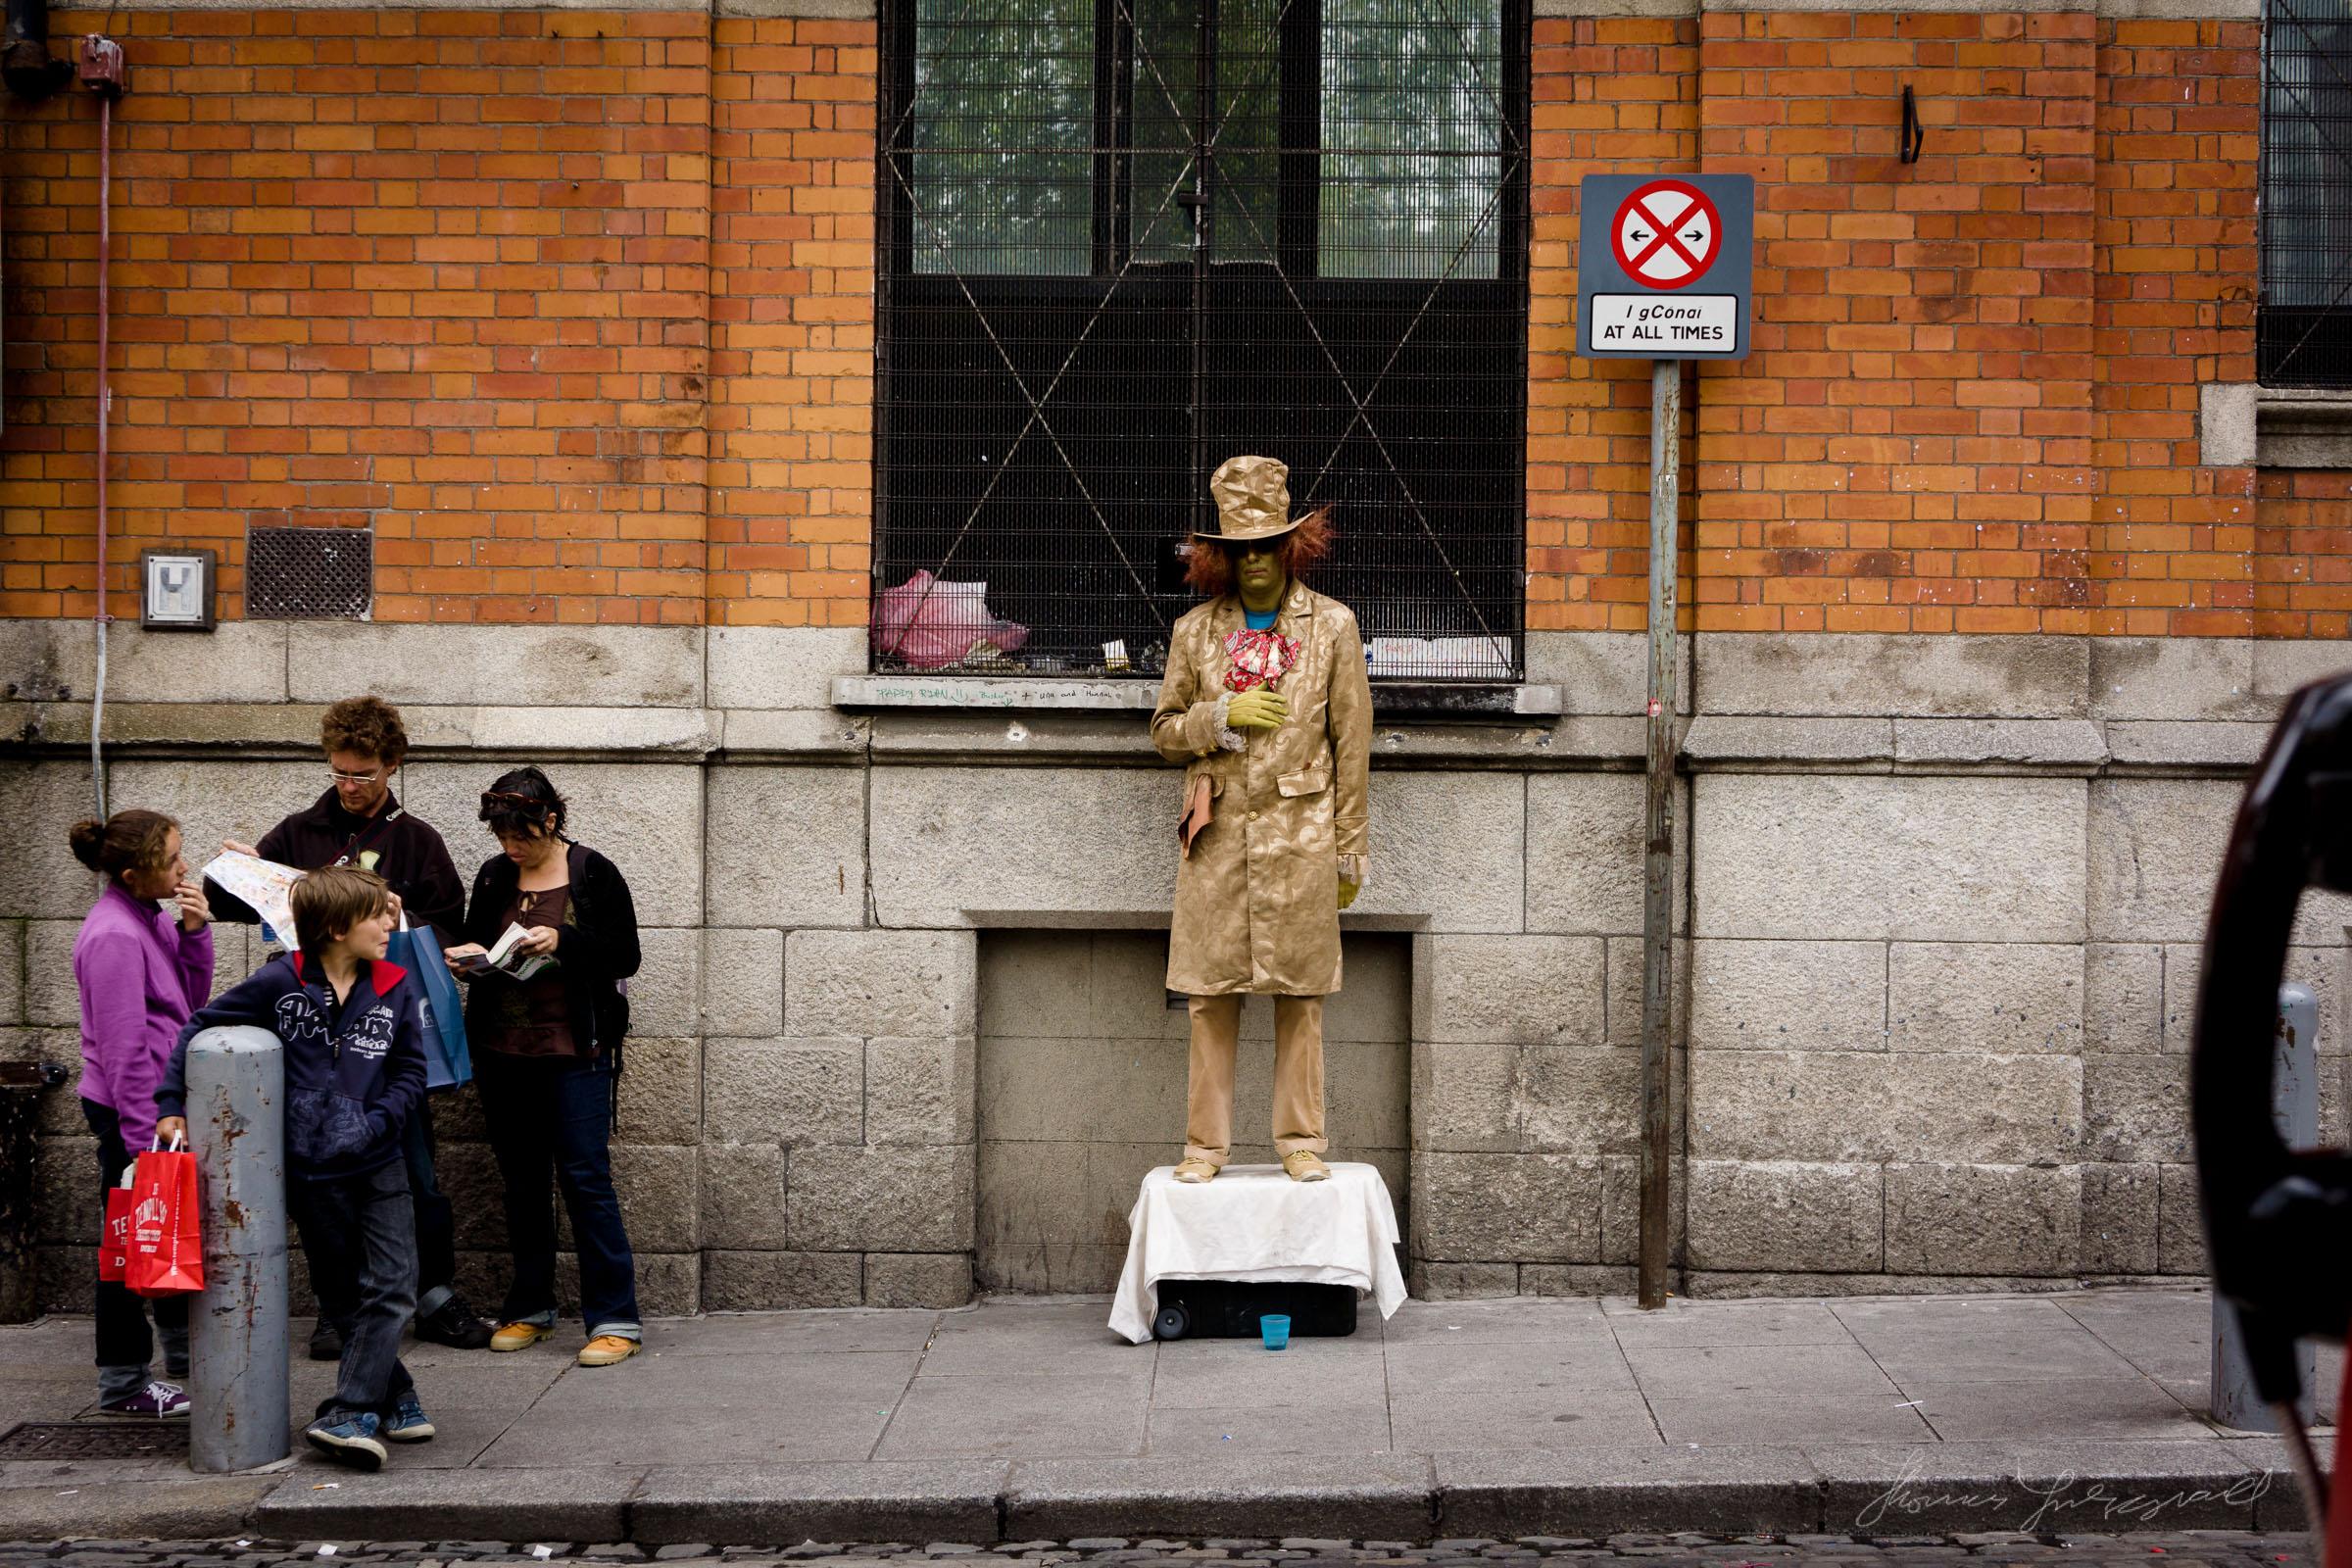 Street Performer in Temple Bar